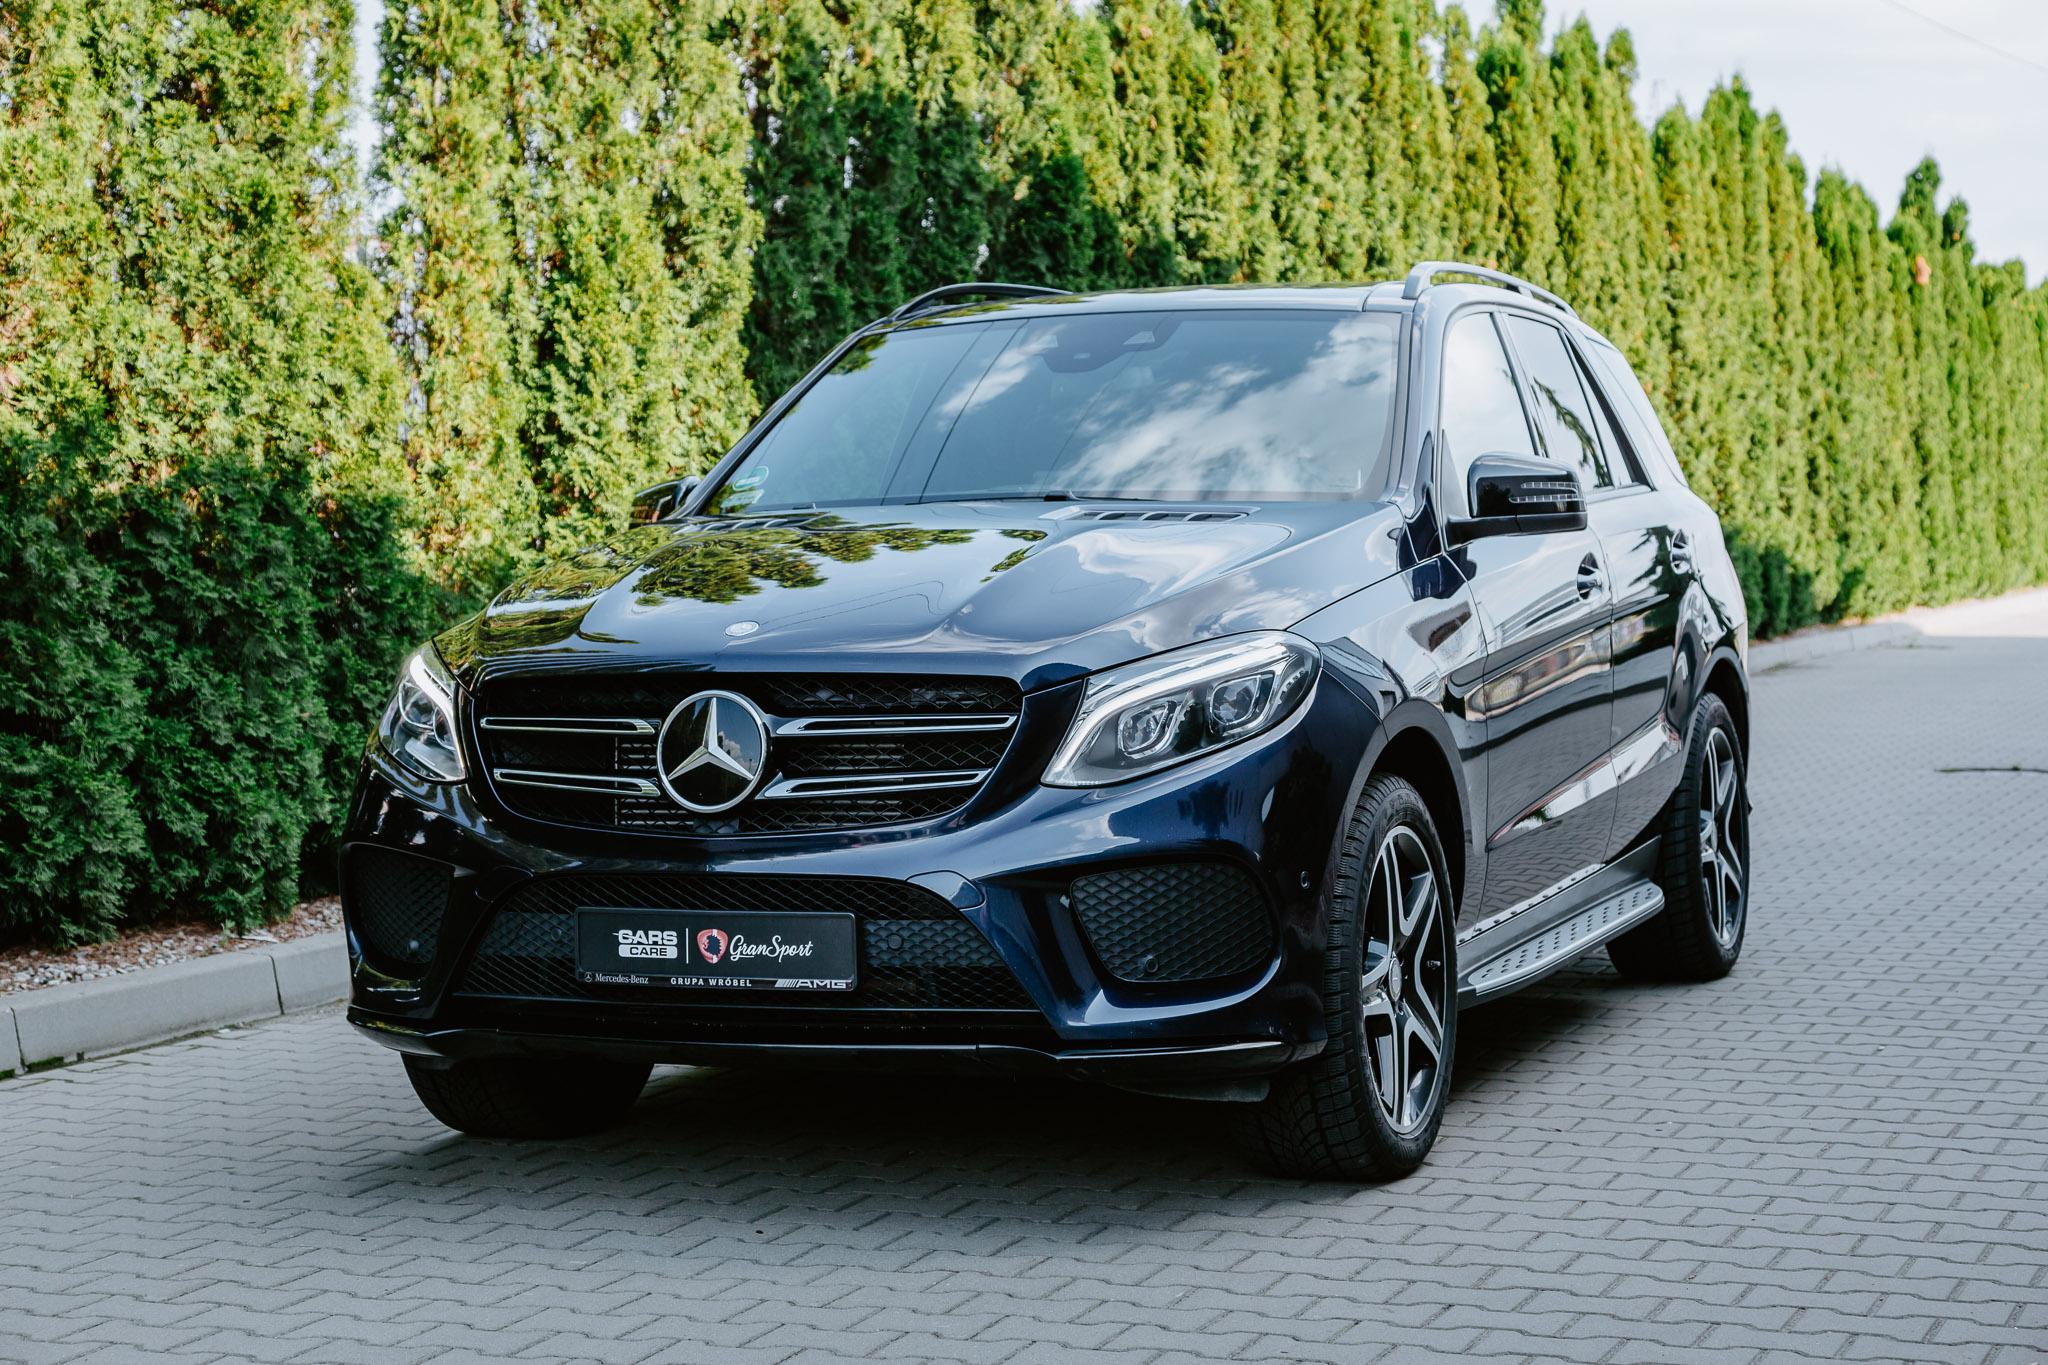 Mercedes-Benz GLE - autodetailing - carscare.pl